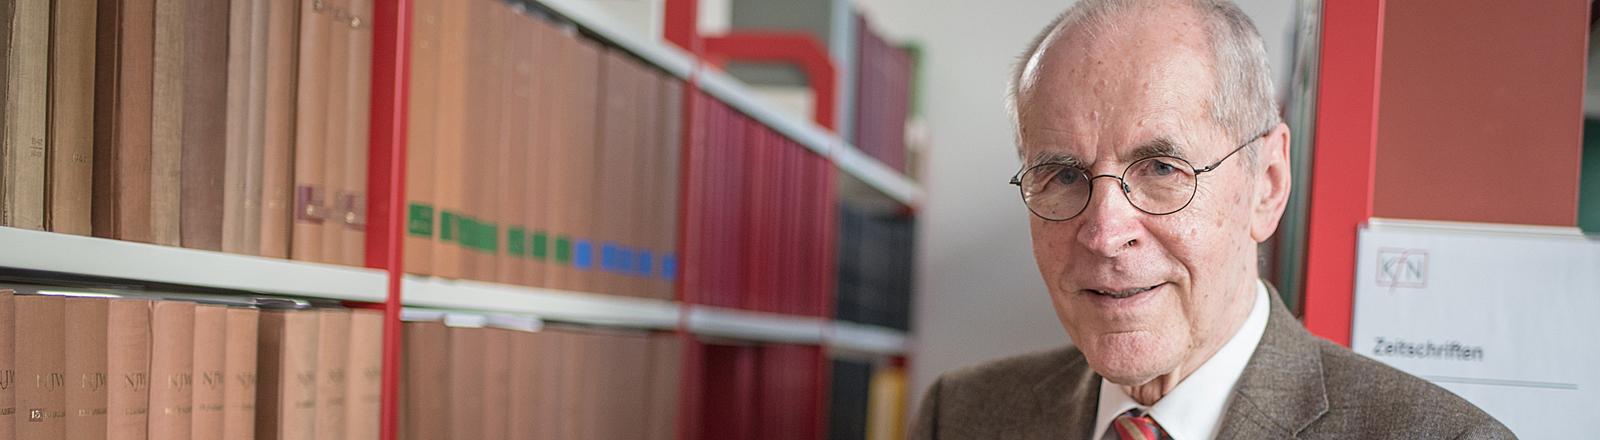 Der Kriminologe Christian Pfeiffer 2015 in Hannover (Niedersachsen).